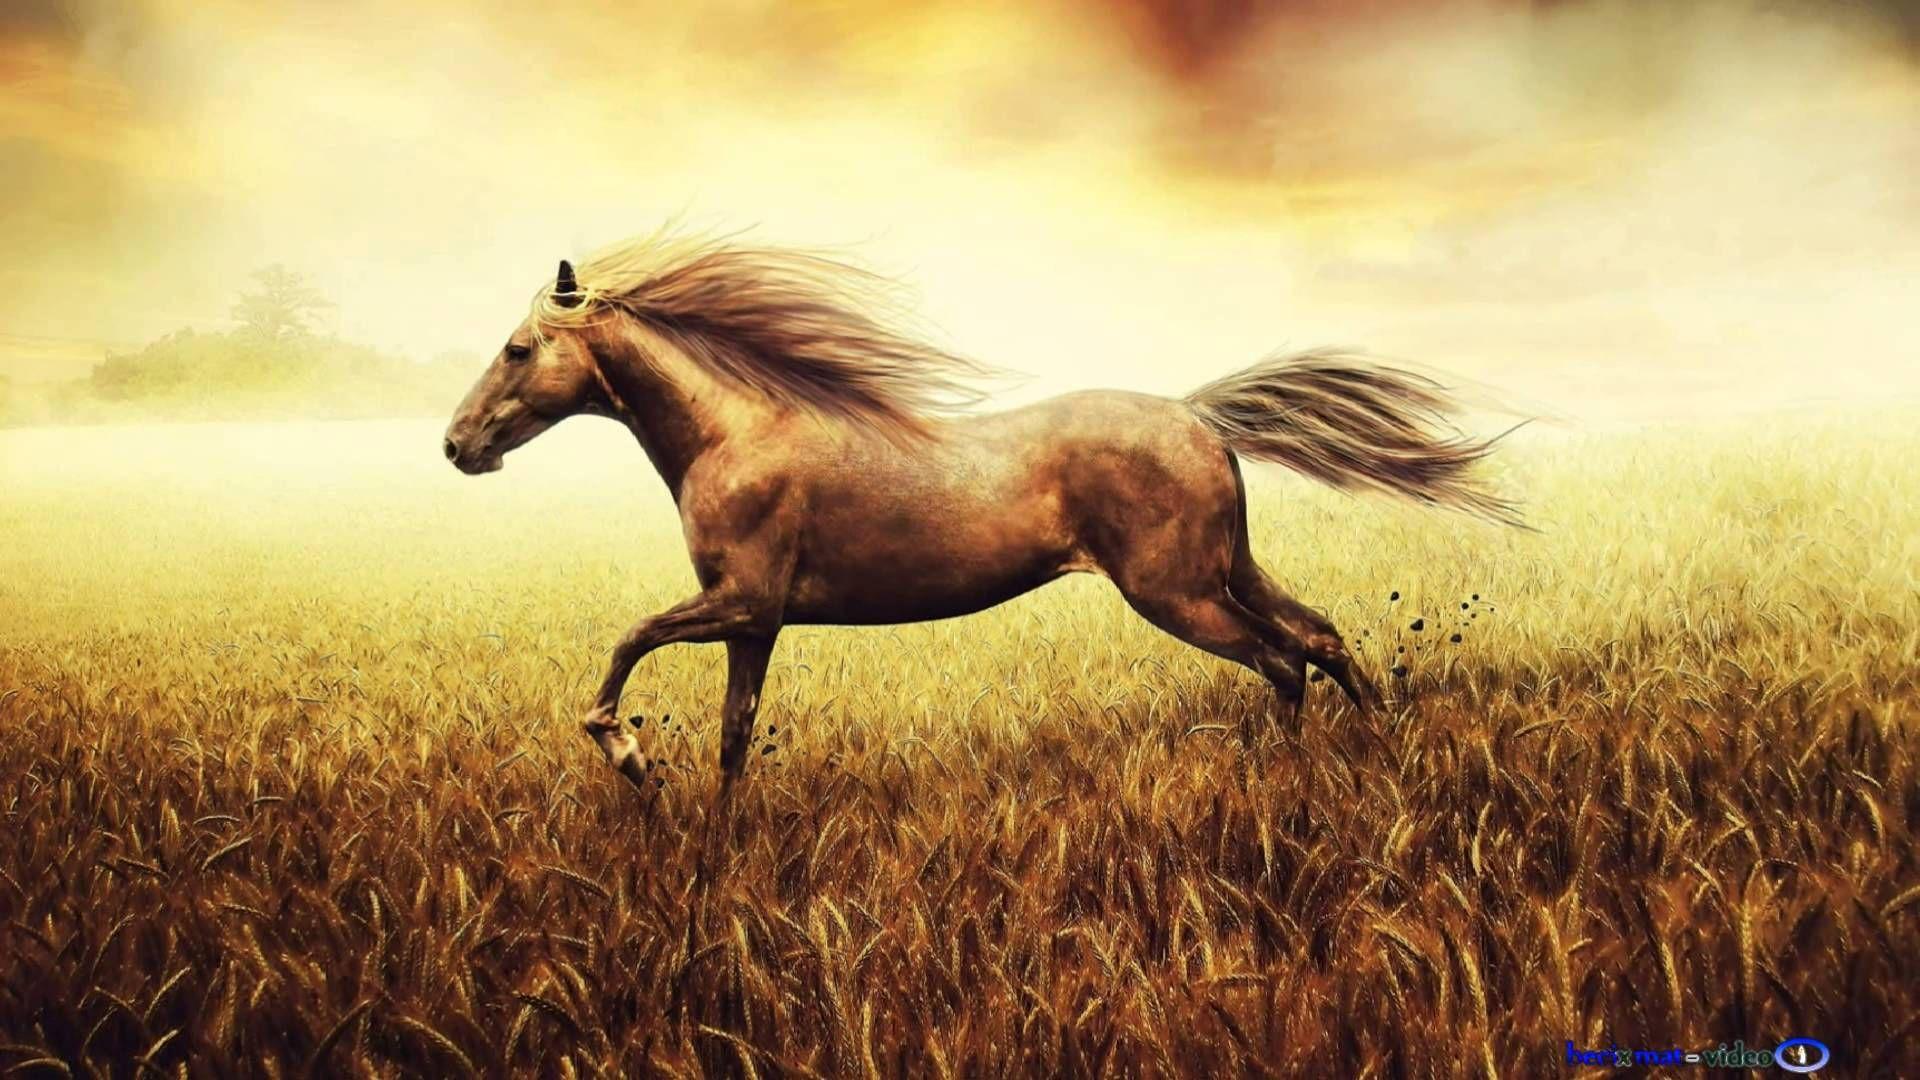 Must see Wallpaper Horse Spirit - 492beff723b8005a744093787ea20d5c  HD_879888.jpg